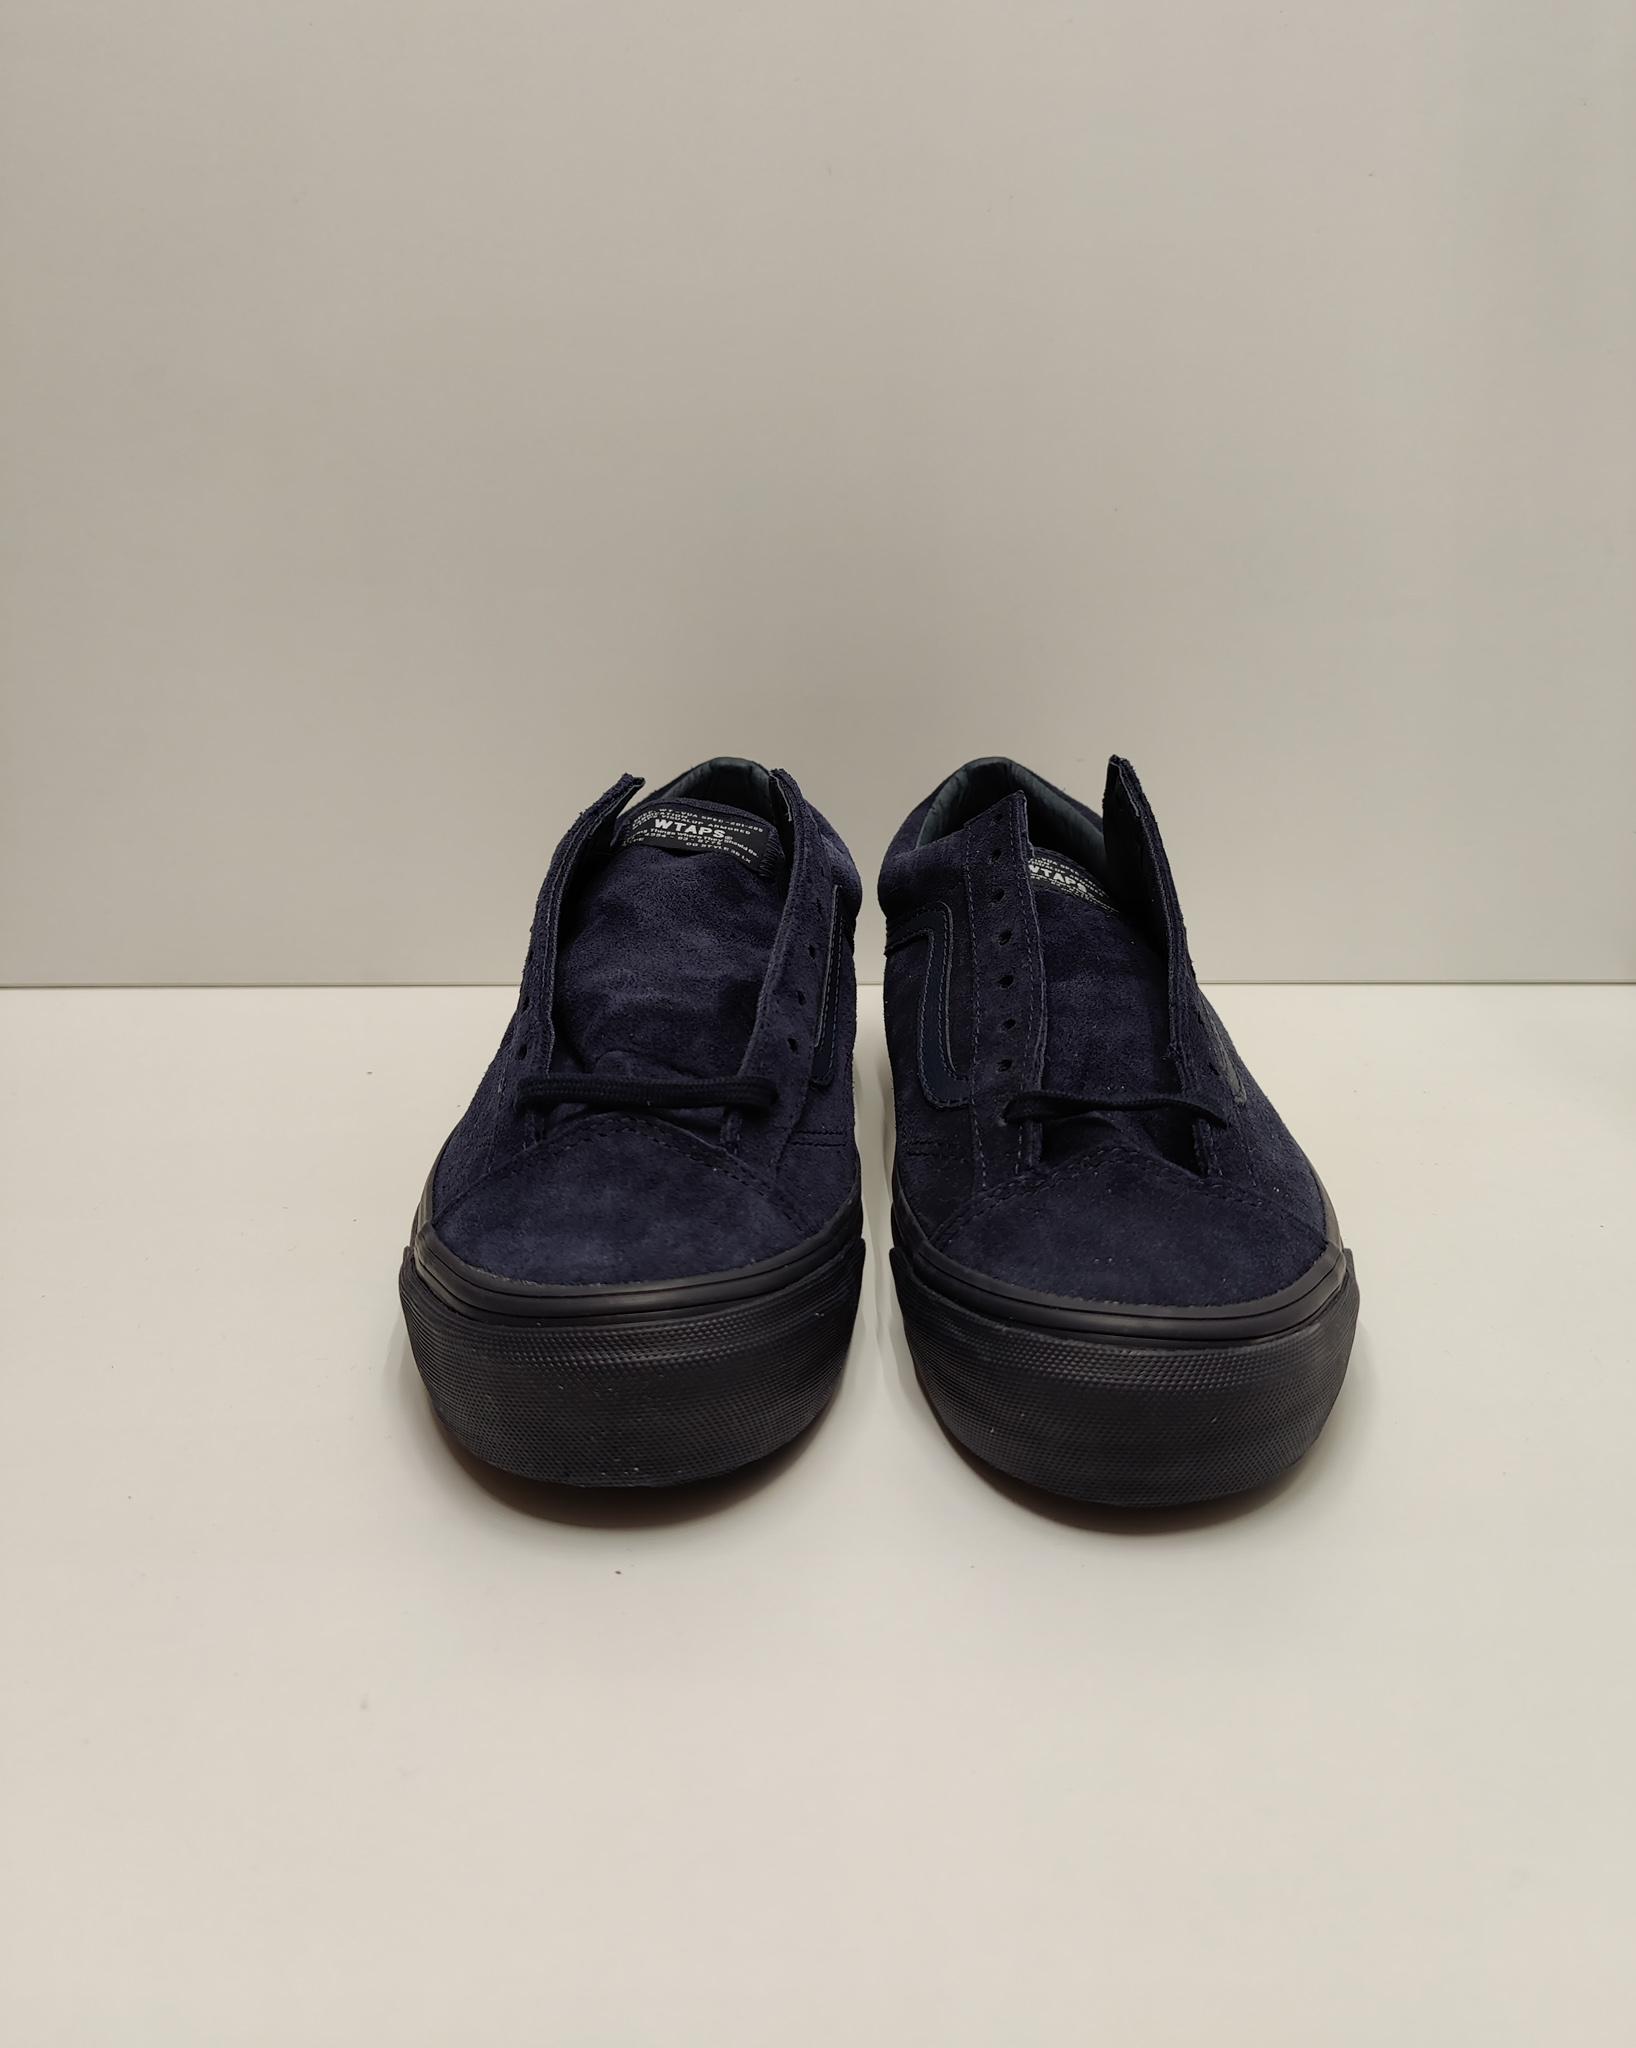 Vans OG Style 36 LX Navy WTAPS